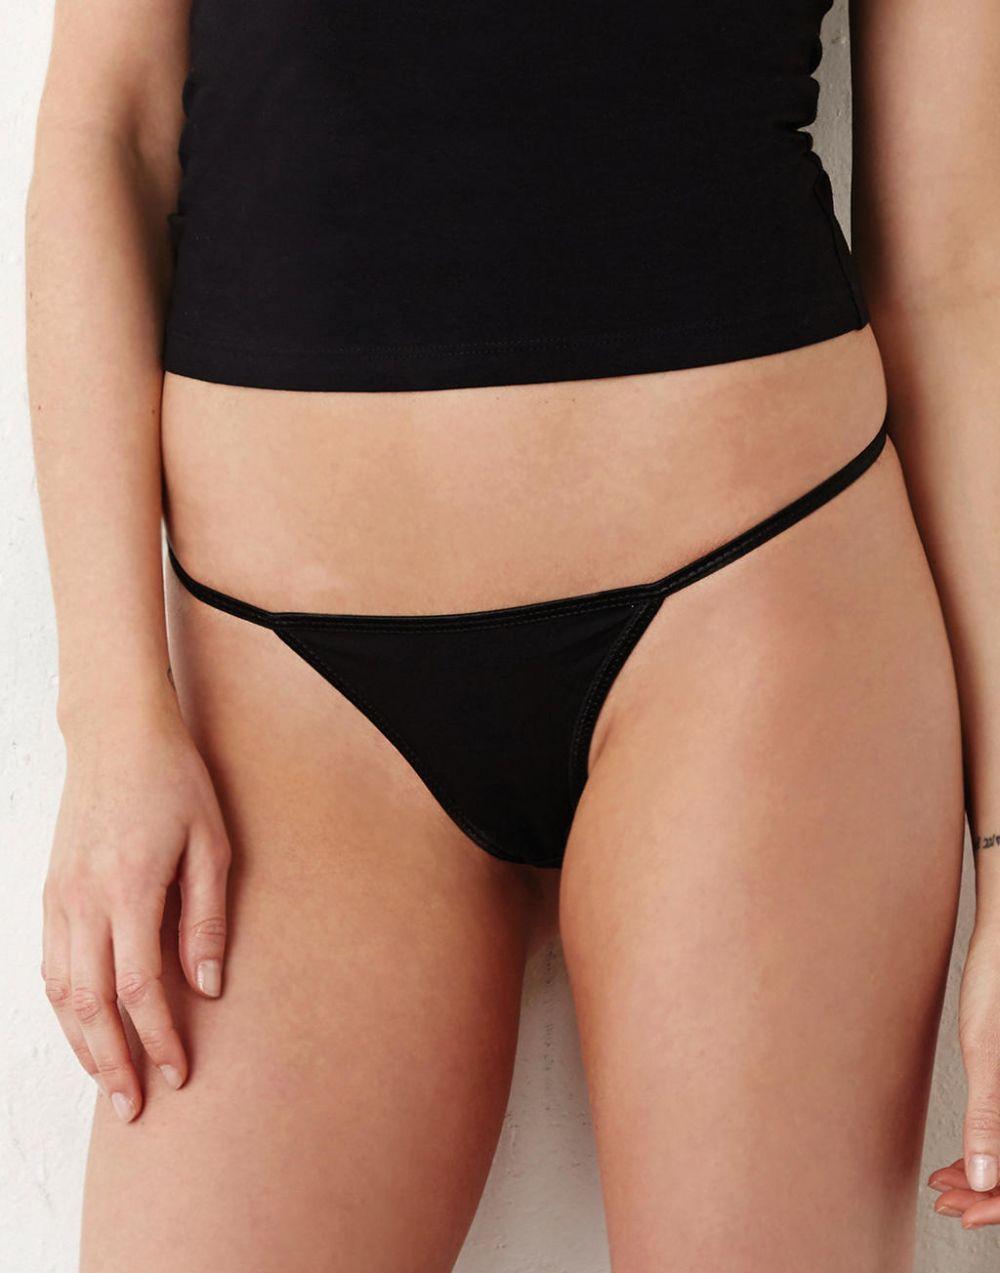 Underwear bella tanga algodón spandex mujer imagen 2